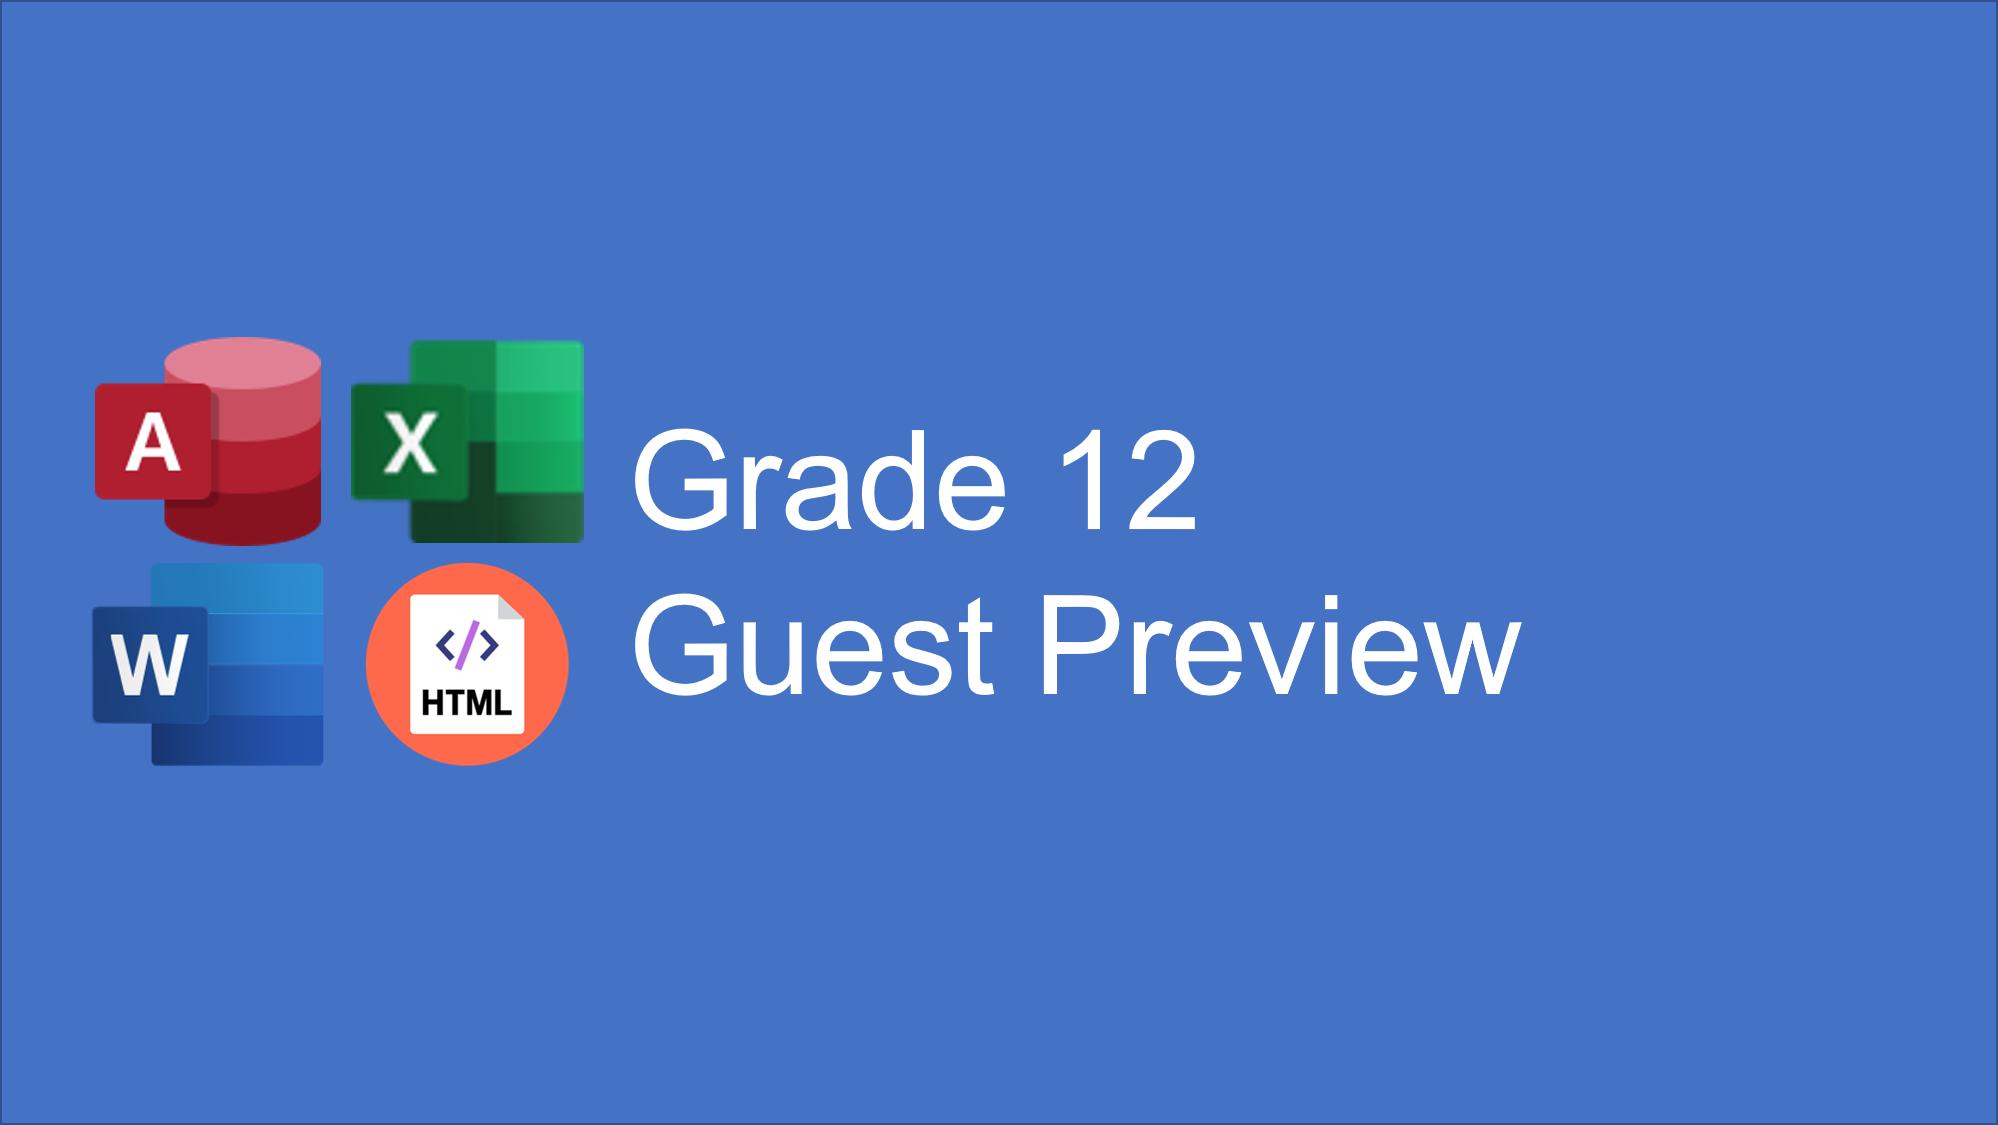 Grade 12 CAT Guest Preview